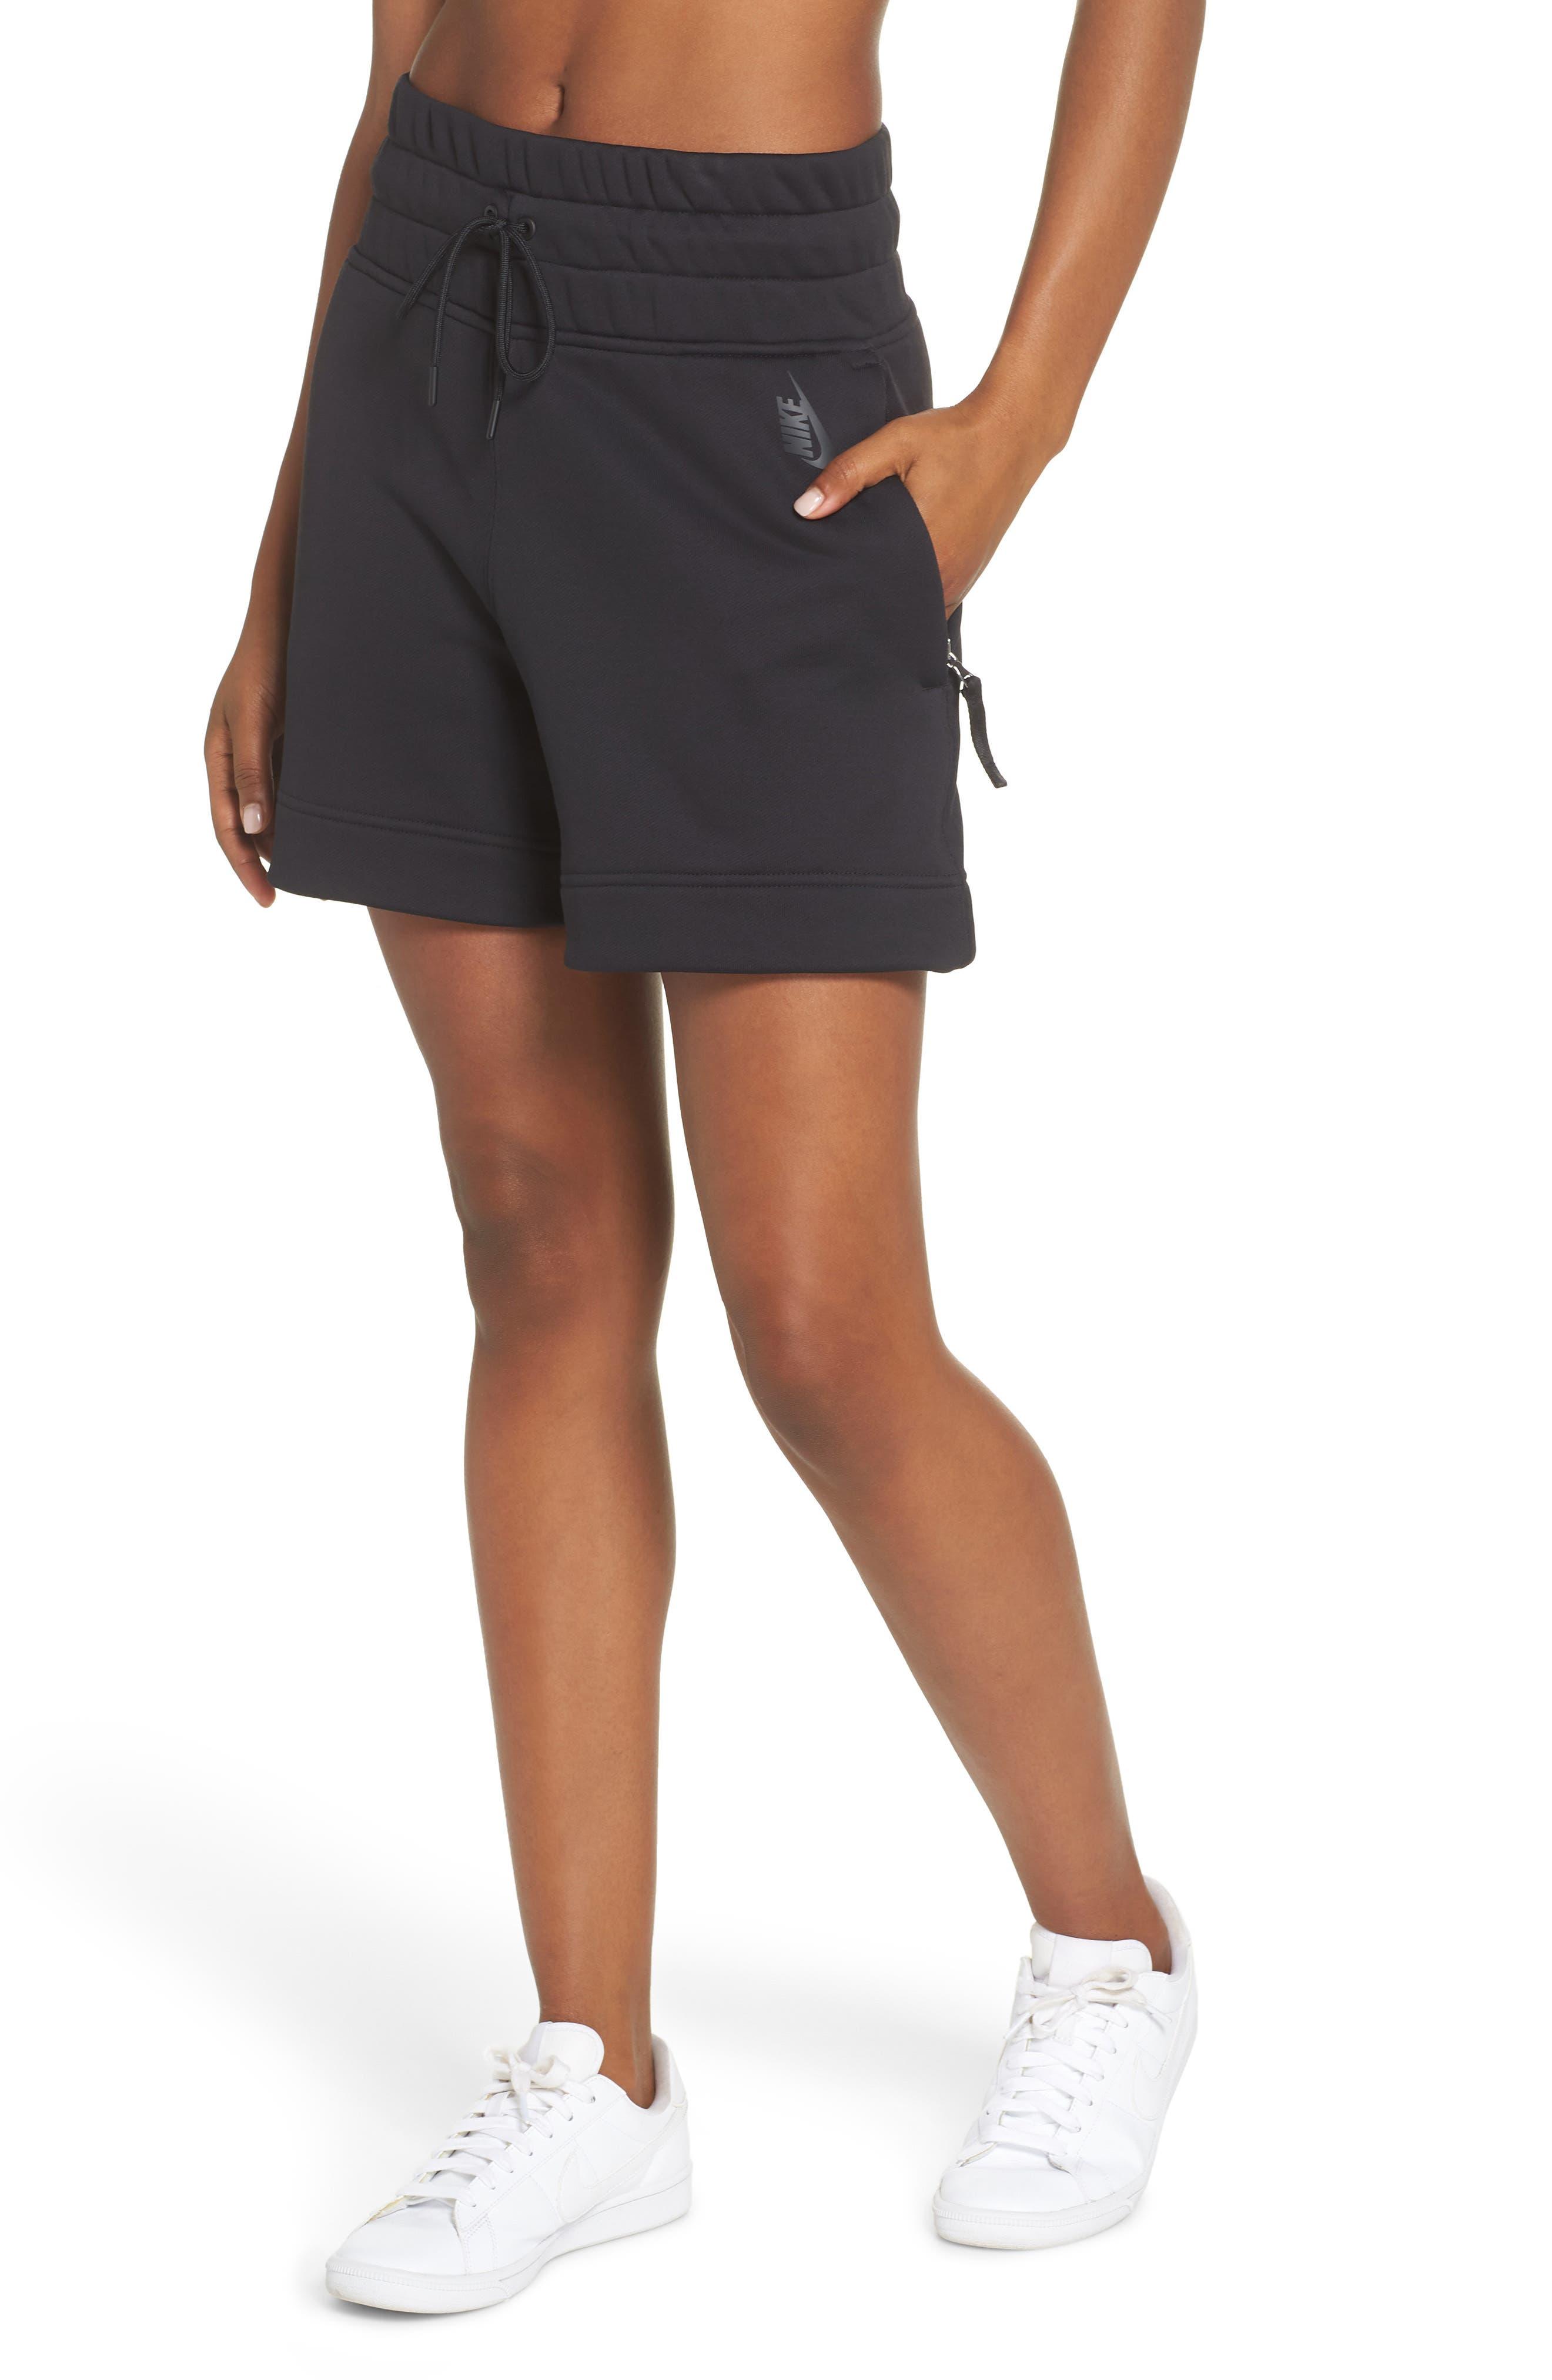 NikeLab Collection Women's Fleece Shorts,                             Main thumbnail 1, color,                             BLACK/ BLACK